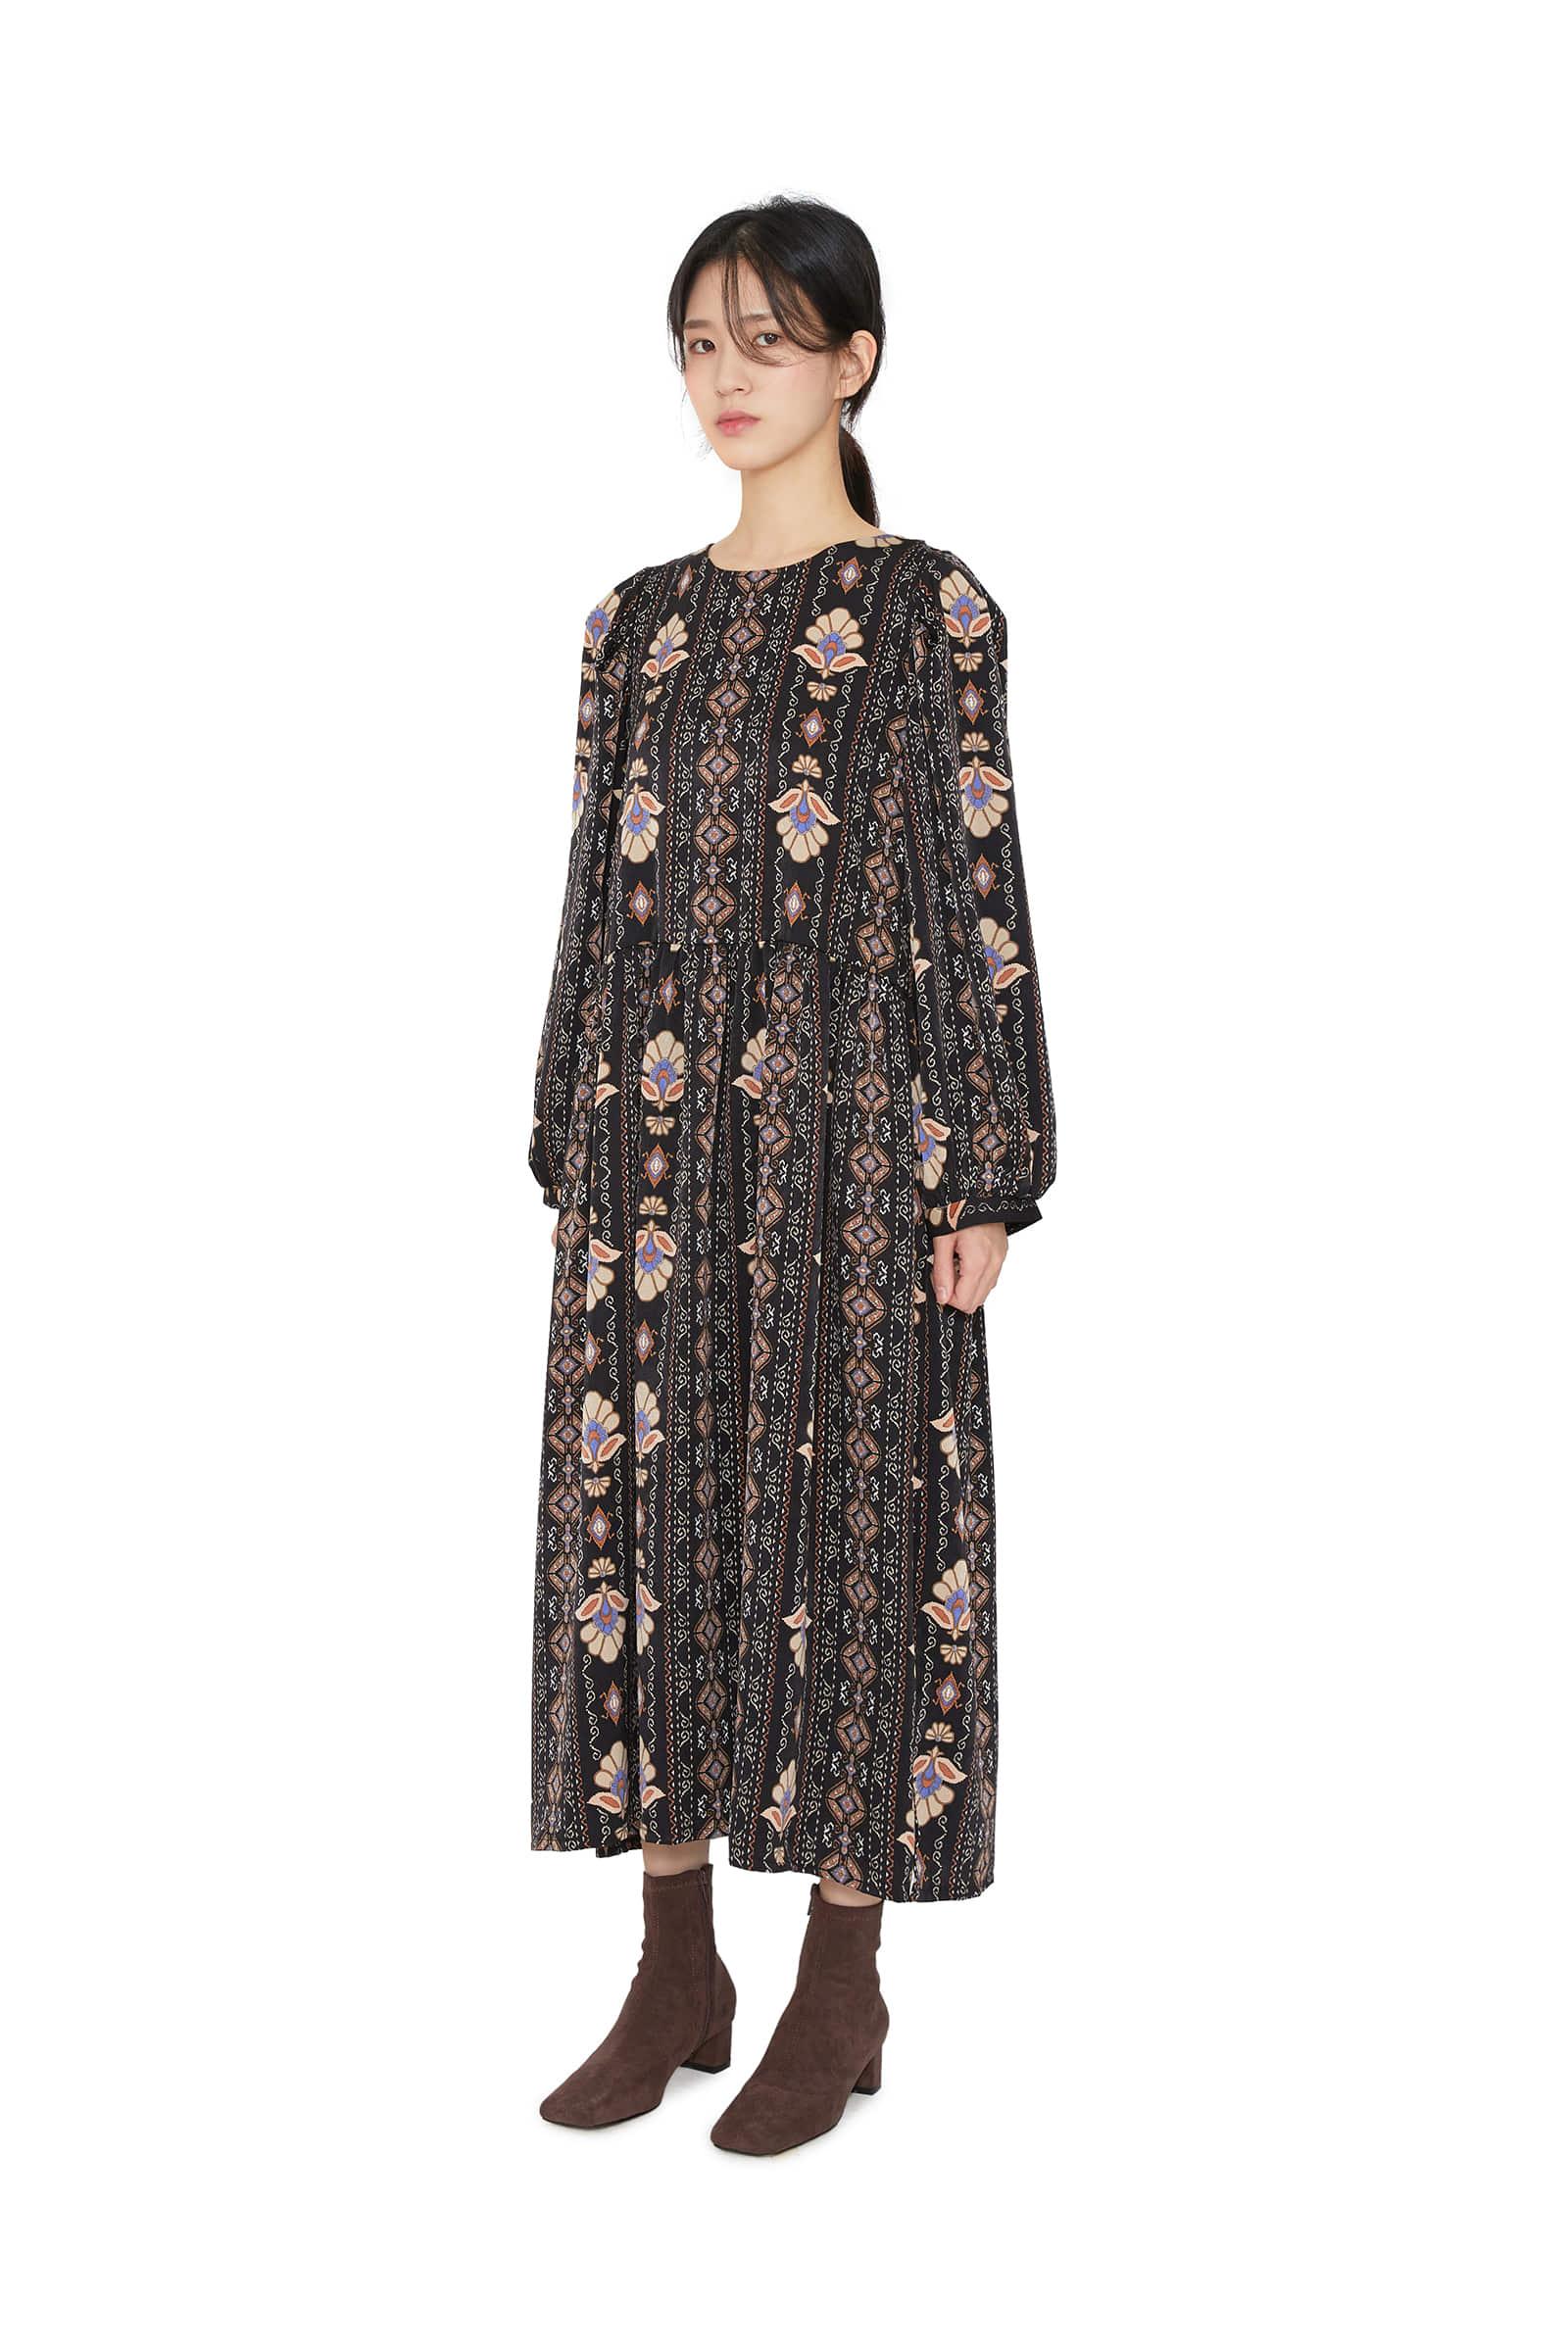 Looney pattern midi dress